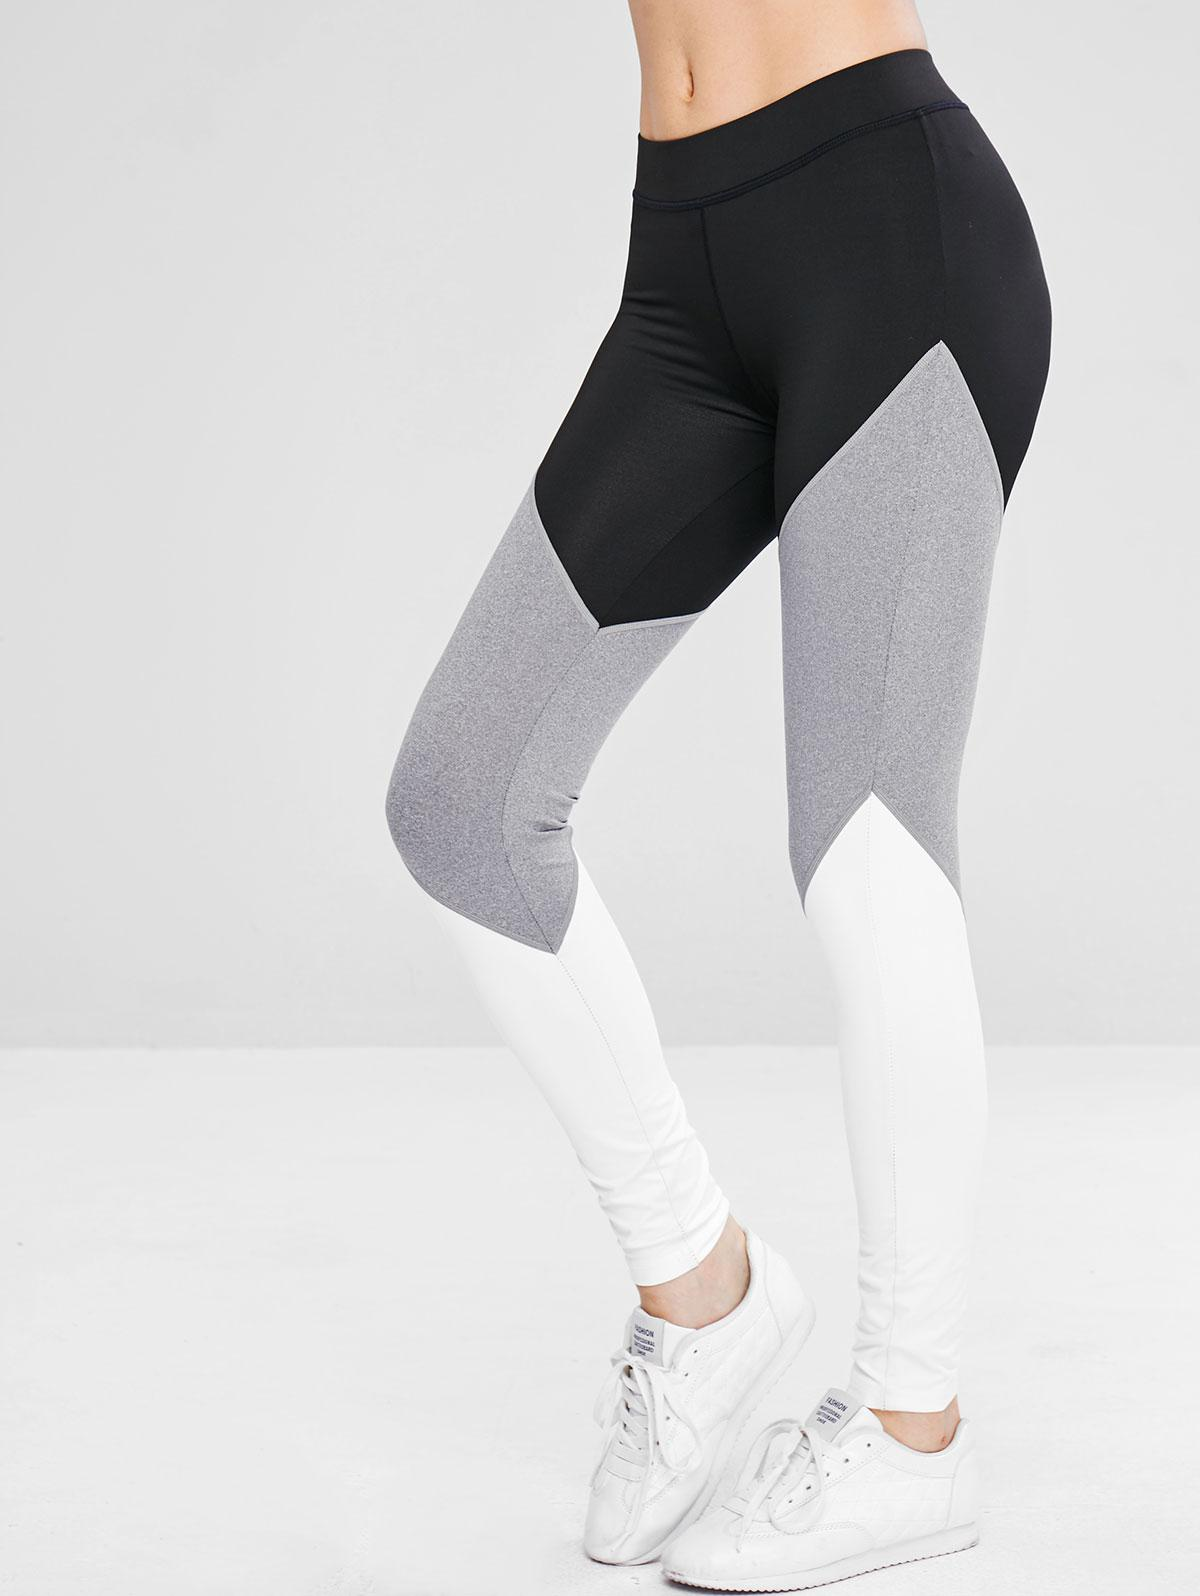 Athletic Color Block Gym Sport Leggings